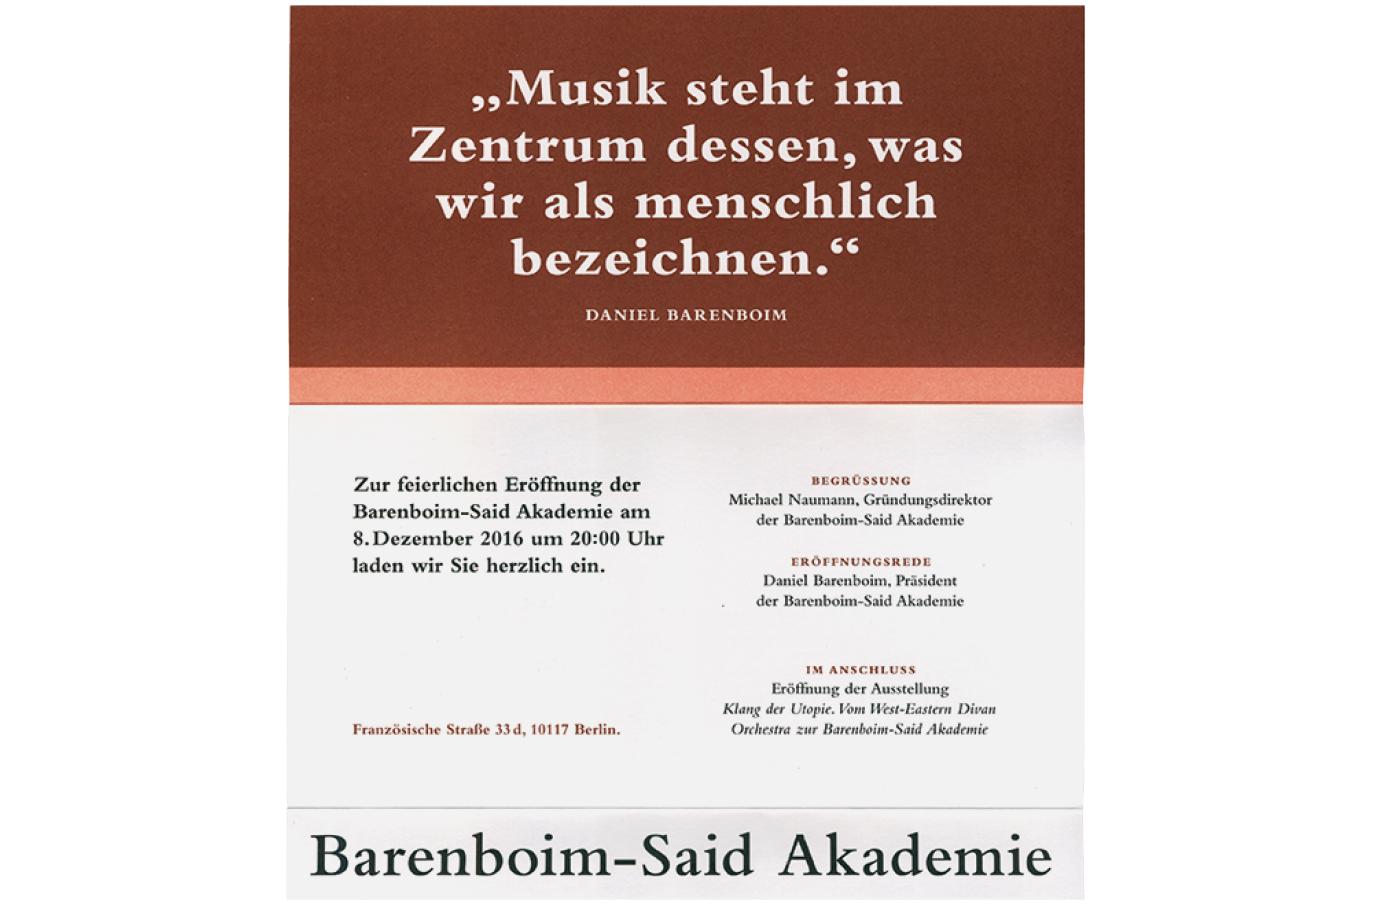 http://e-o-t.de/wordpress/wp-content/uploads/2017/02/2014_eot-Barenboim-Said-Identity-05.jpg